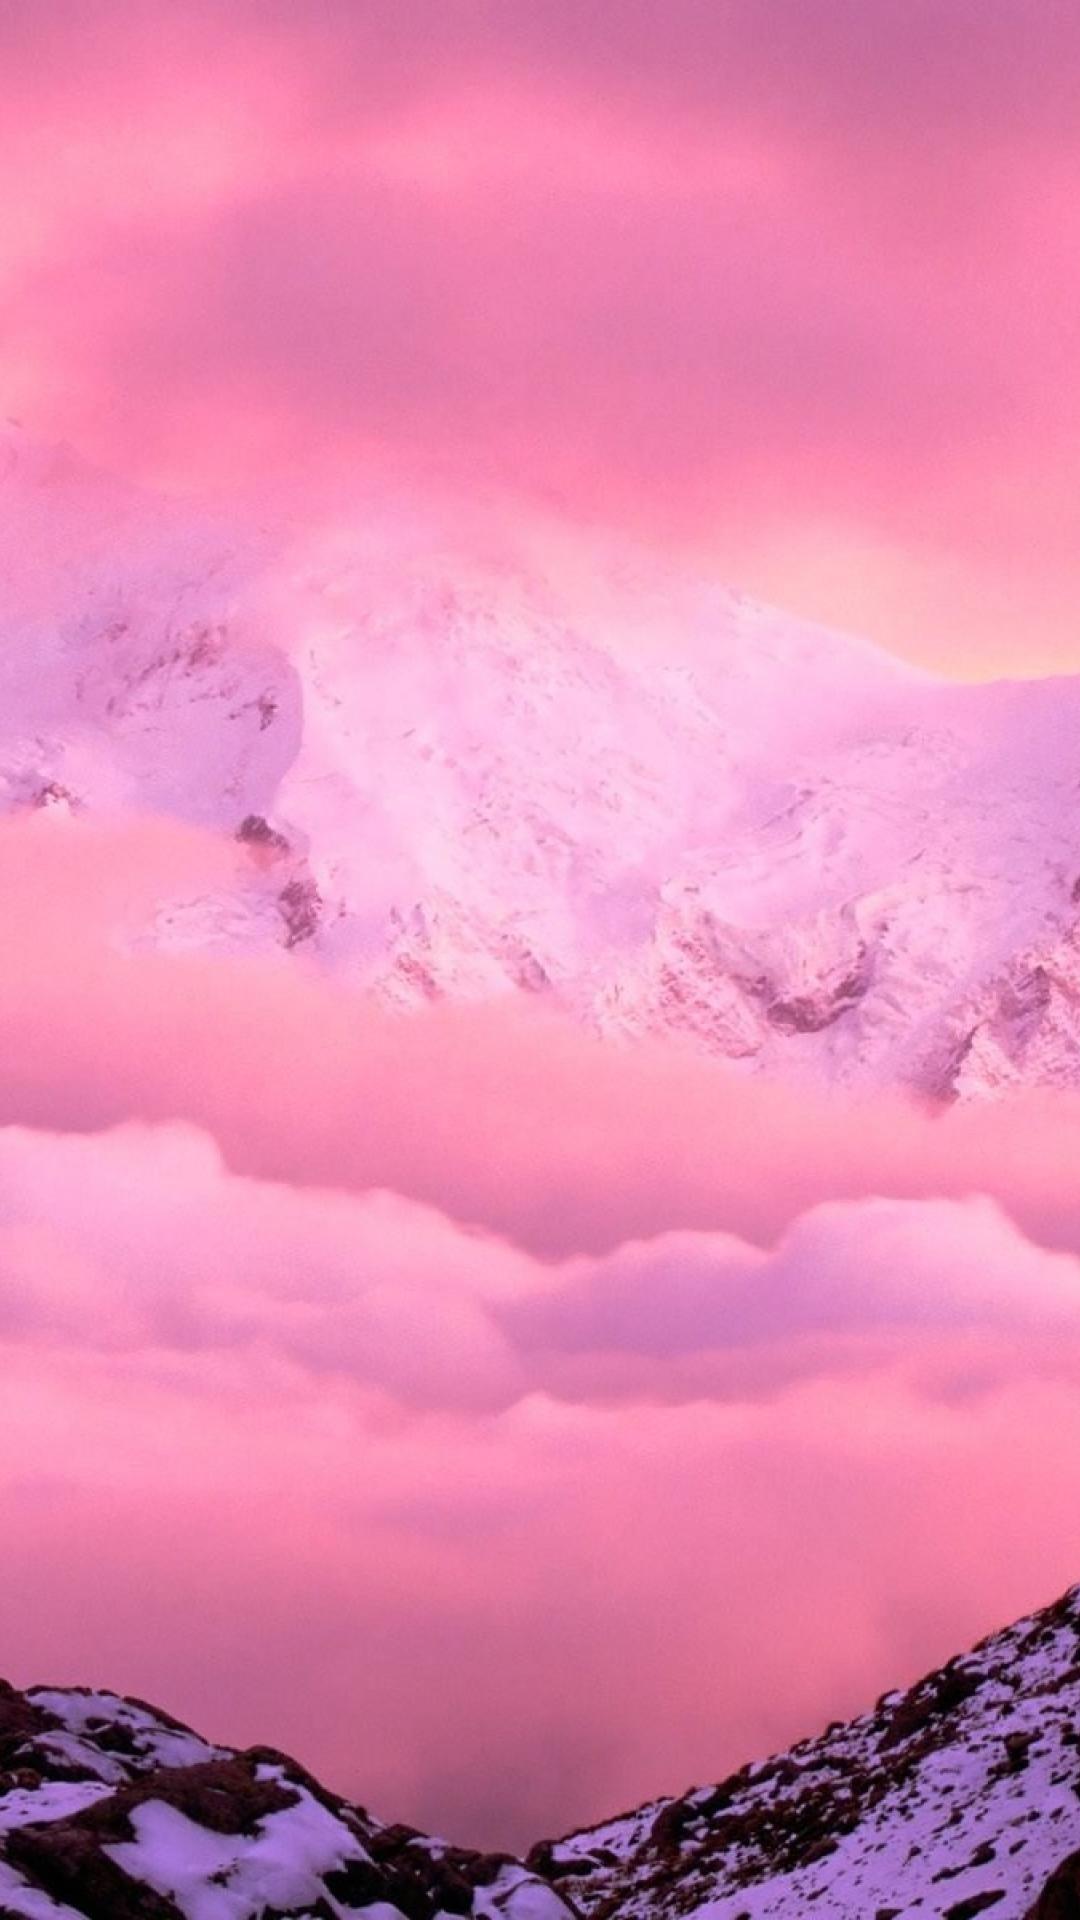 Iphoneのためのピンクの壁紙 ピンクのiphoneの壁紙 1080x1920 Wallpapertip